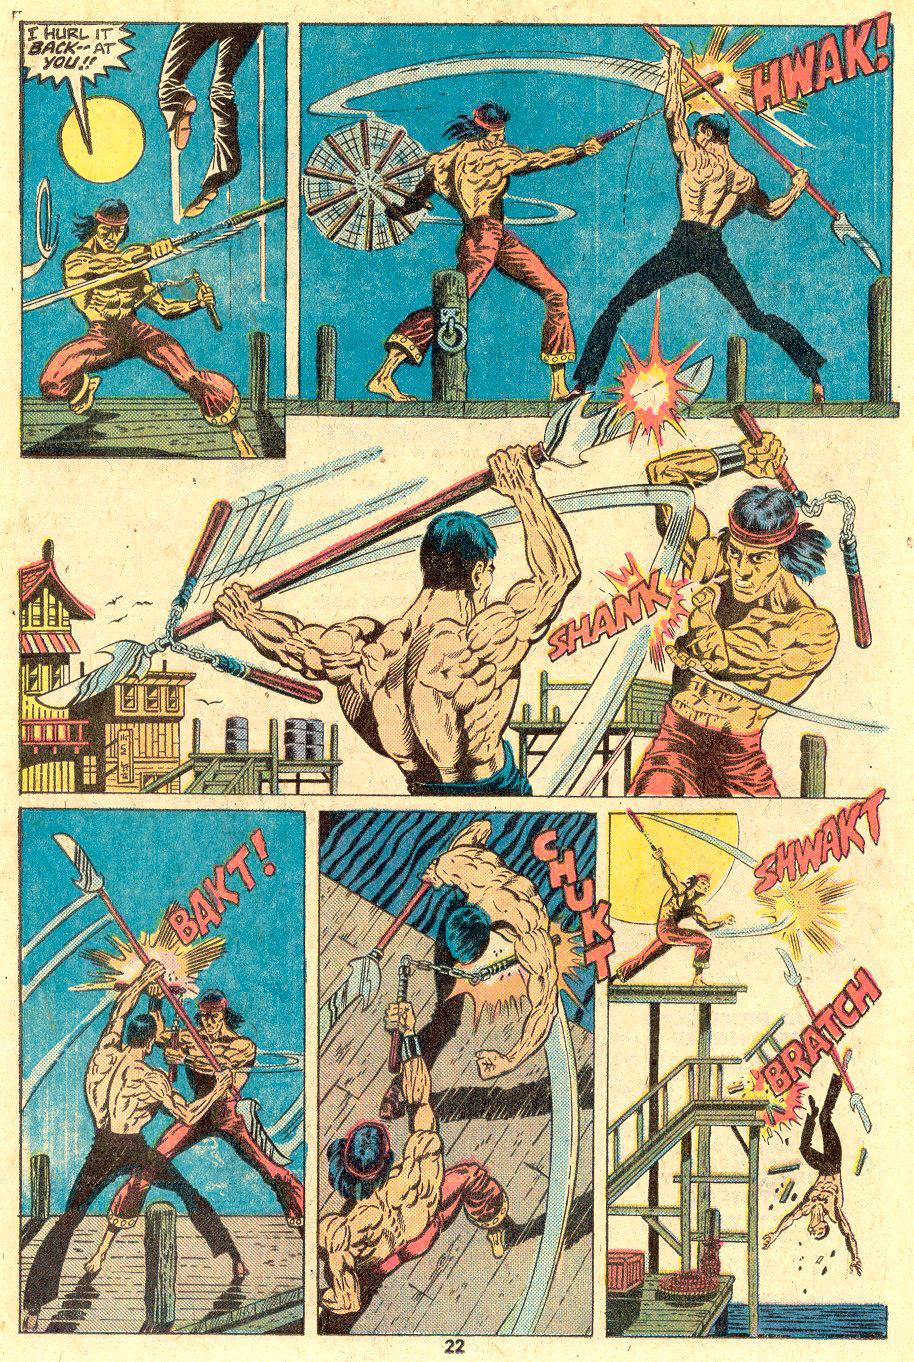 Mestre do Kung Fu enfrenta Shen Kuei, arte de Paul Gulacy